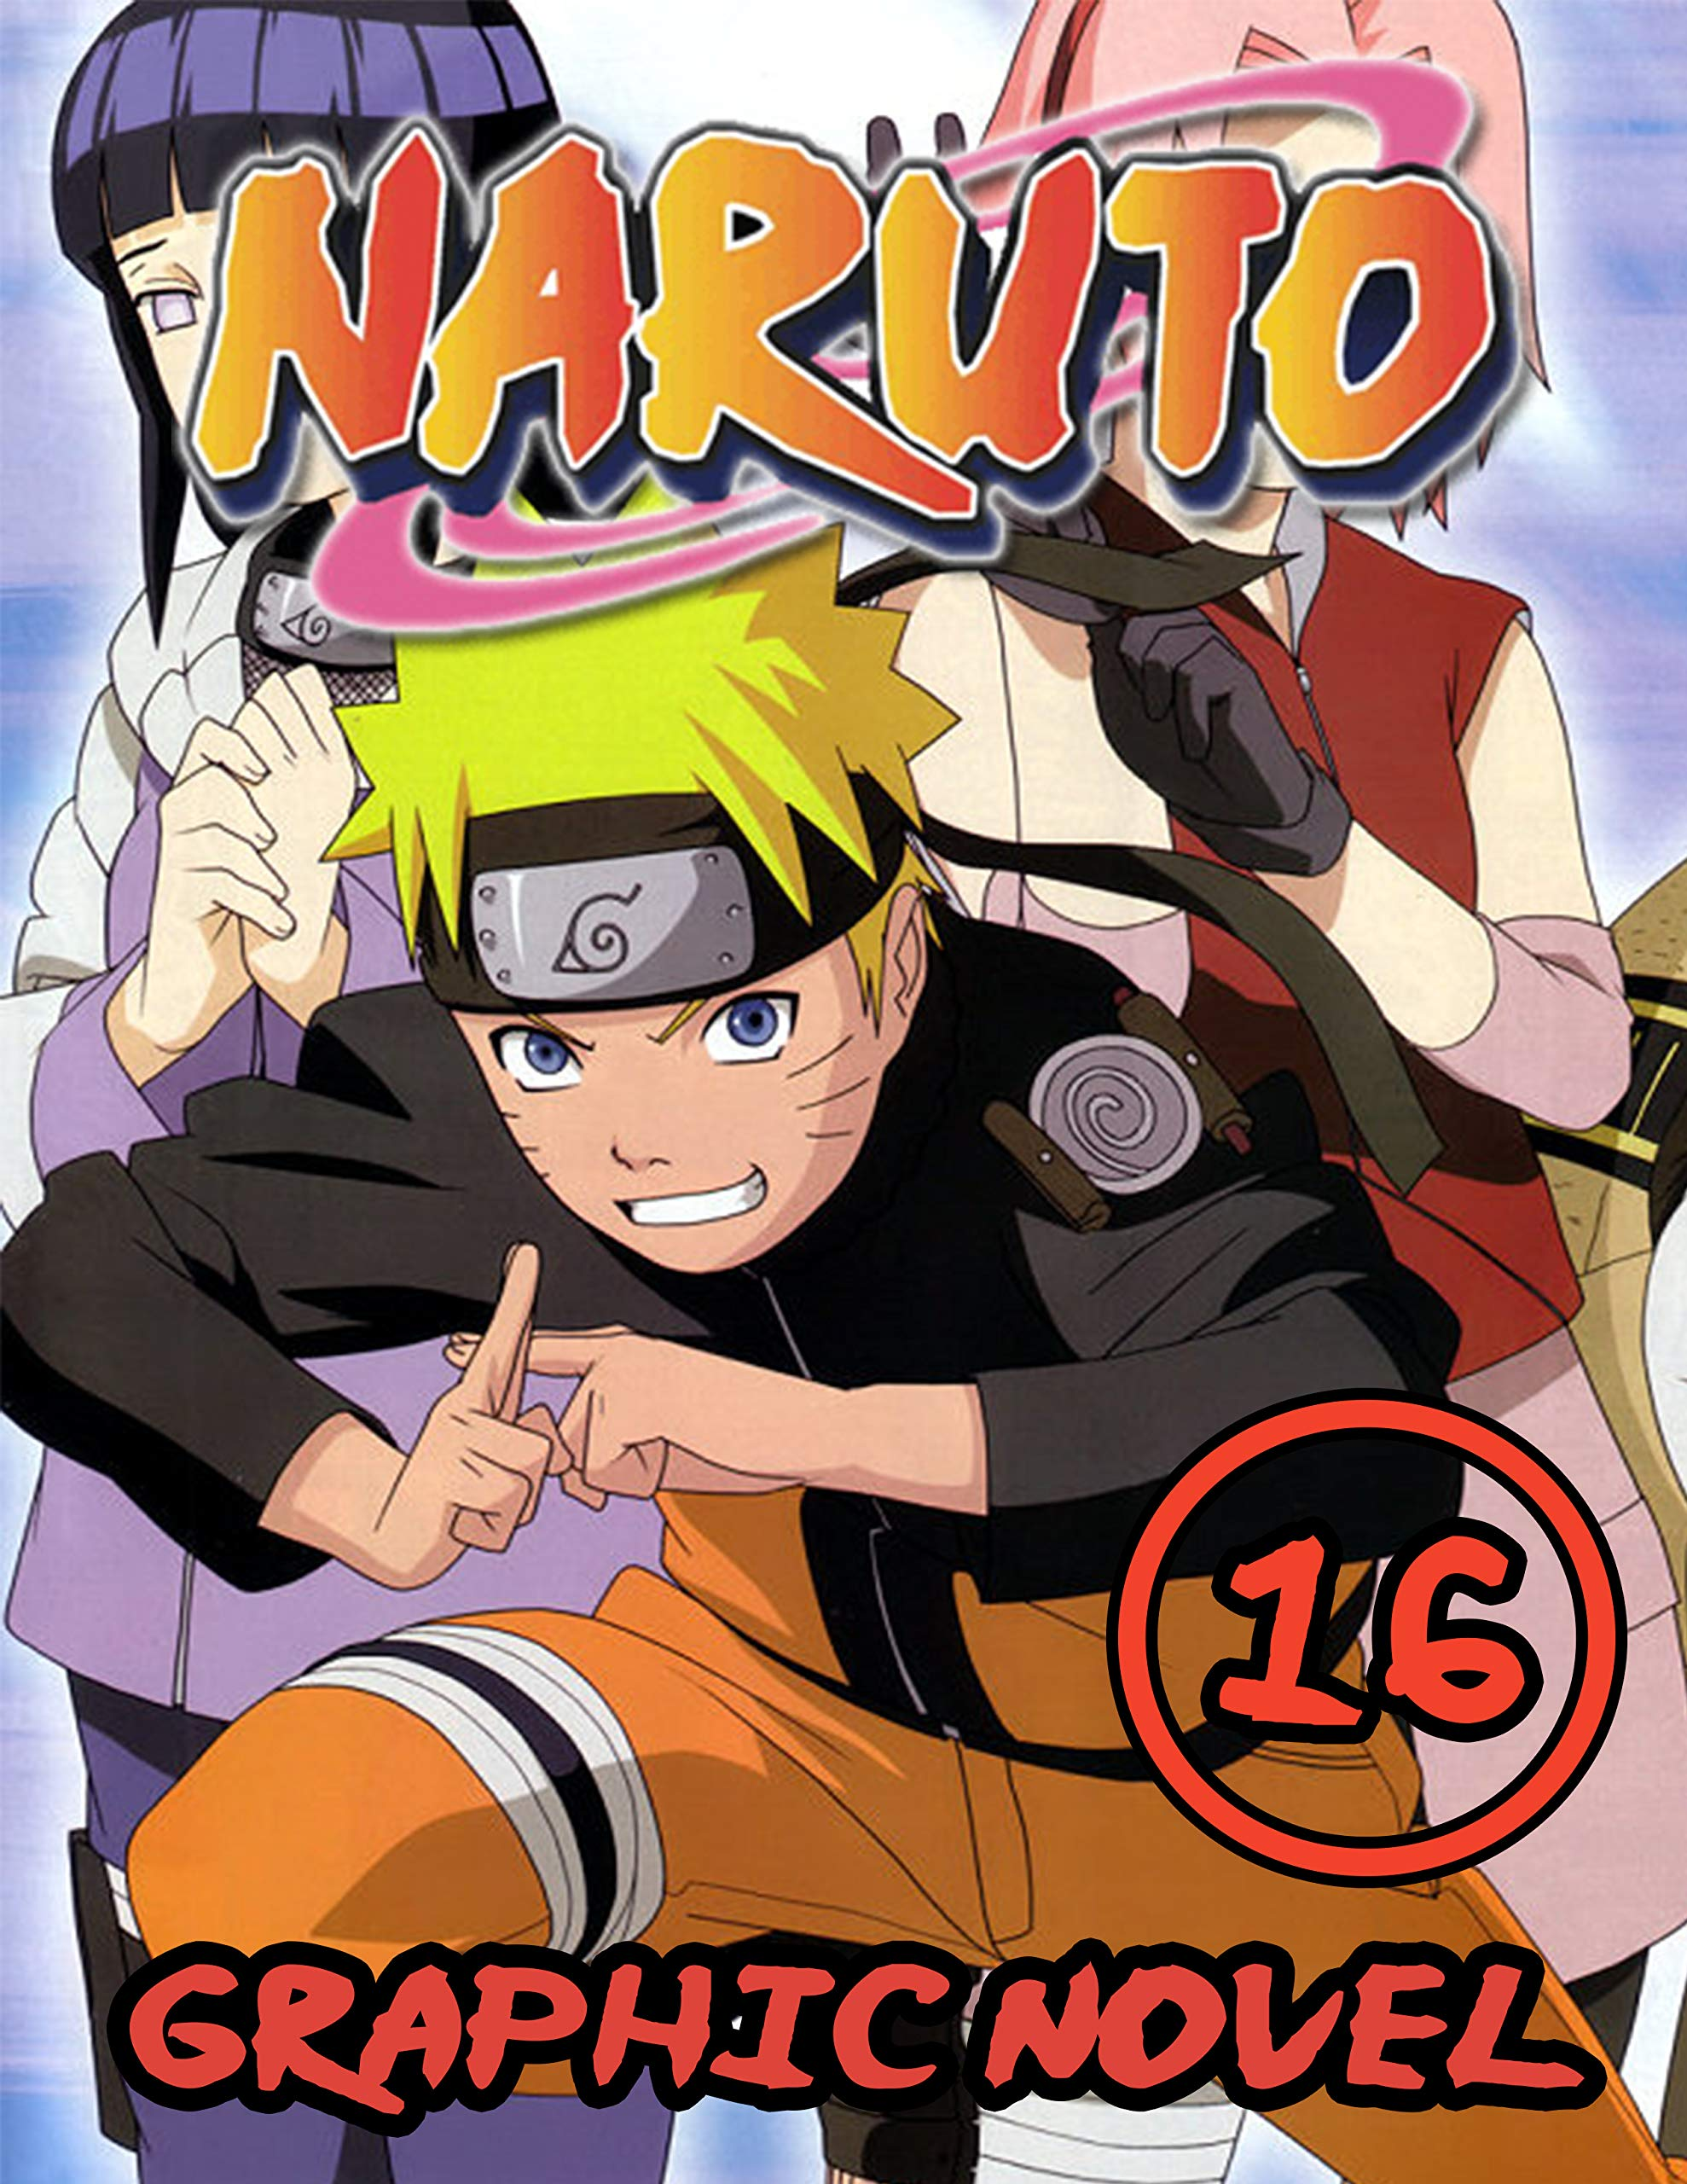 Naruto Graphic Novel: Vol 16 - Full Color Great Shounen Manga For Young & Teens , Adults